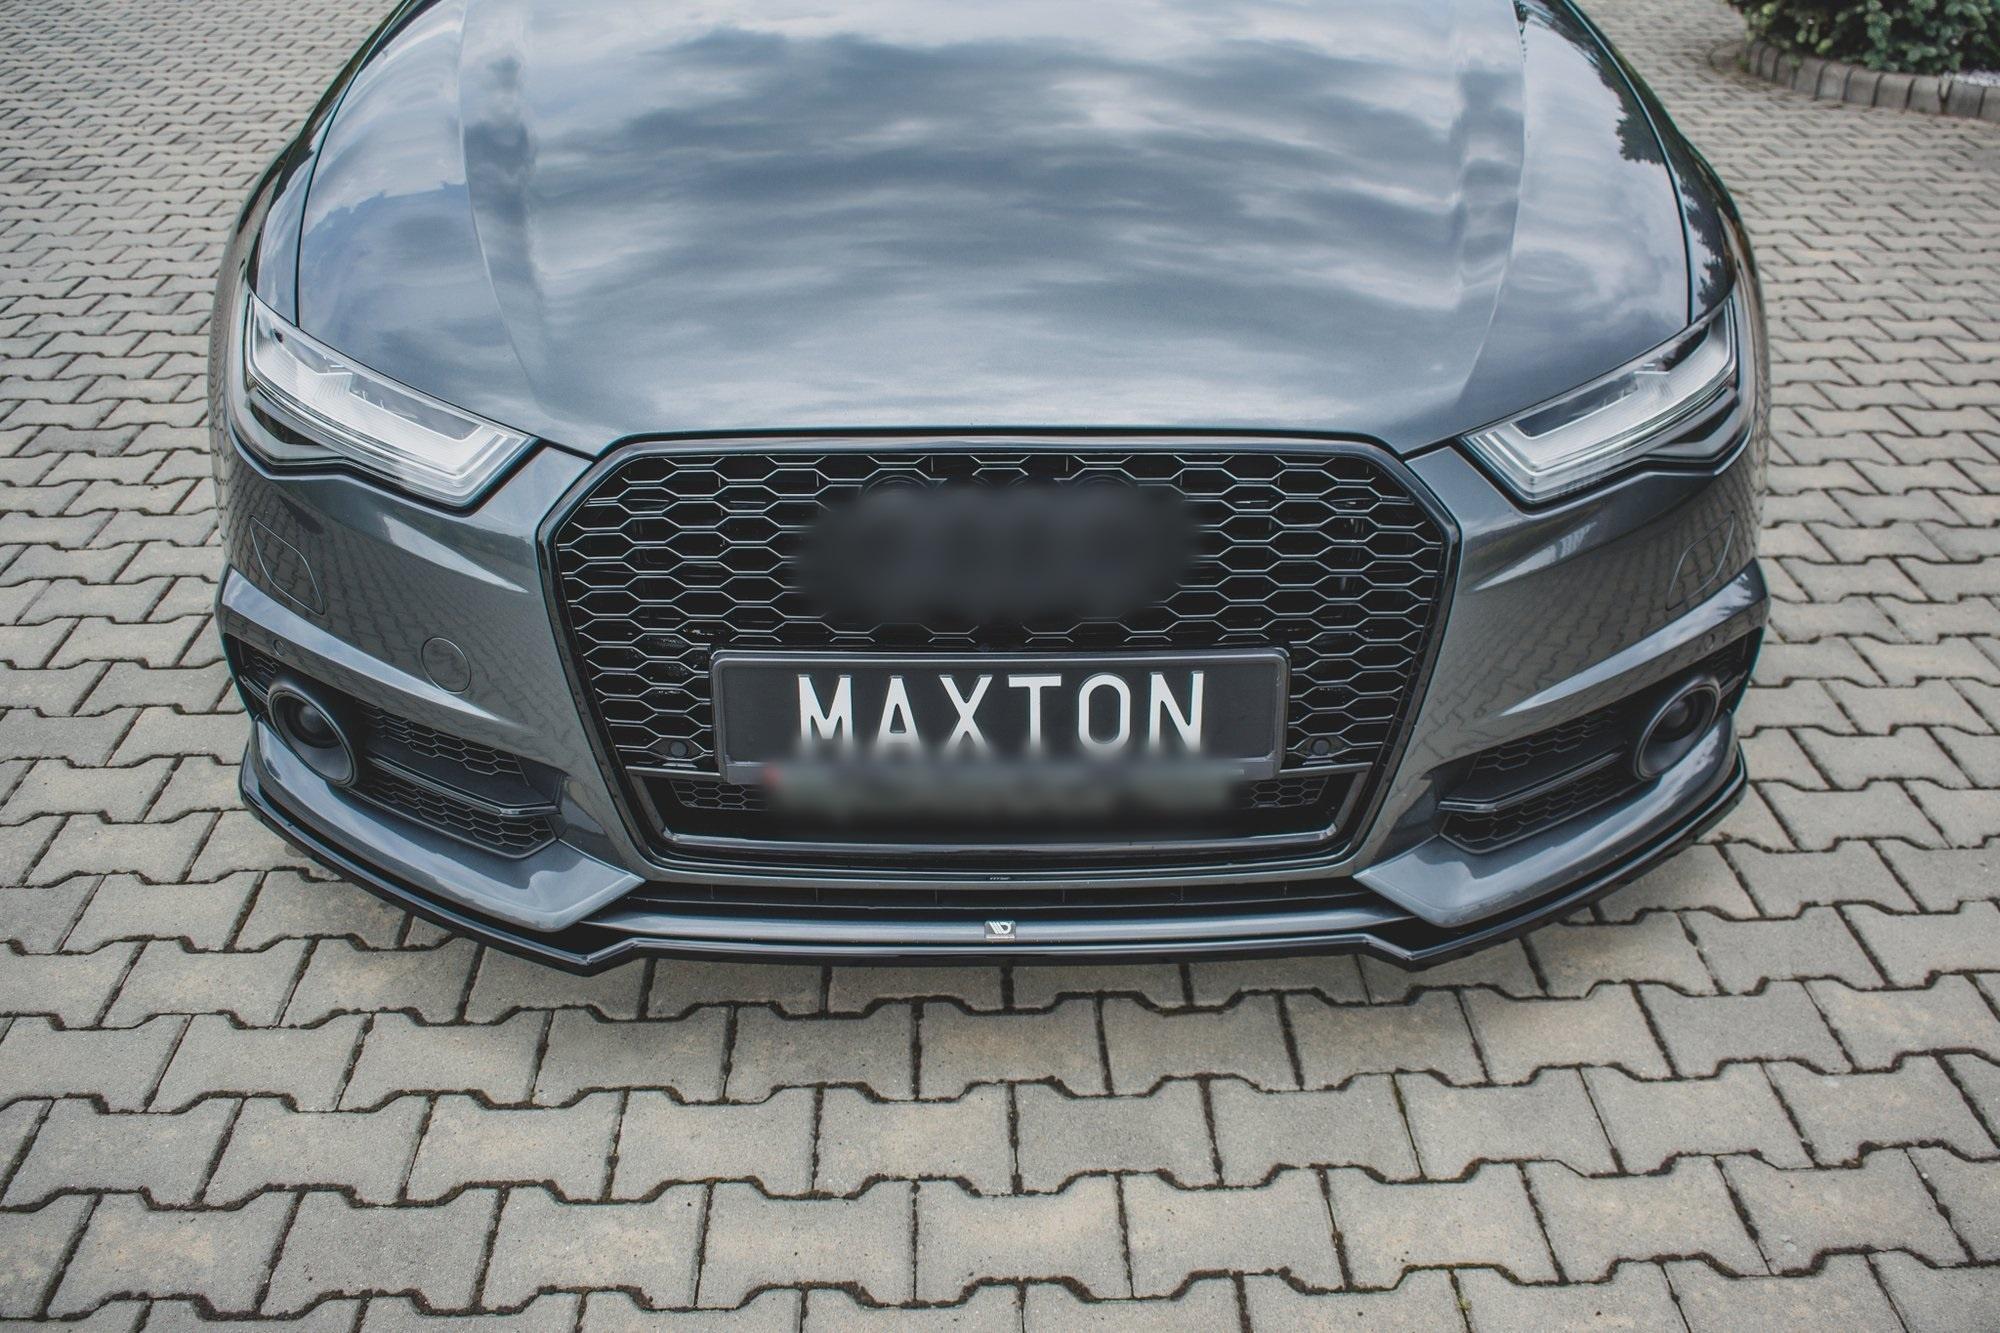 Front Splitter For Audi A6 C7 5 Facelift S Line S6 Www Dejavucars Eu